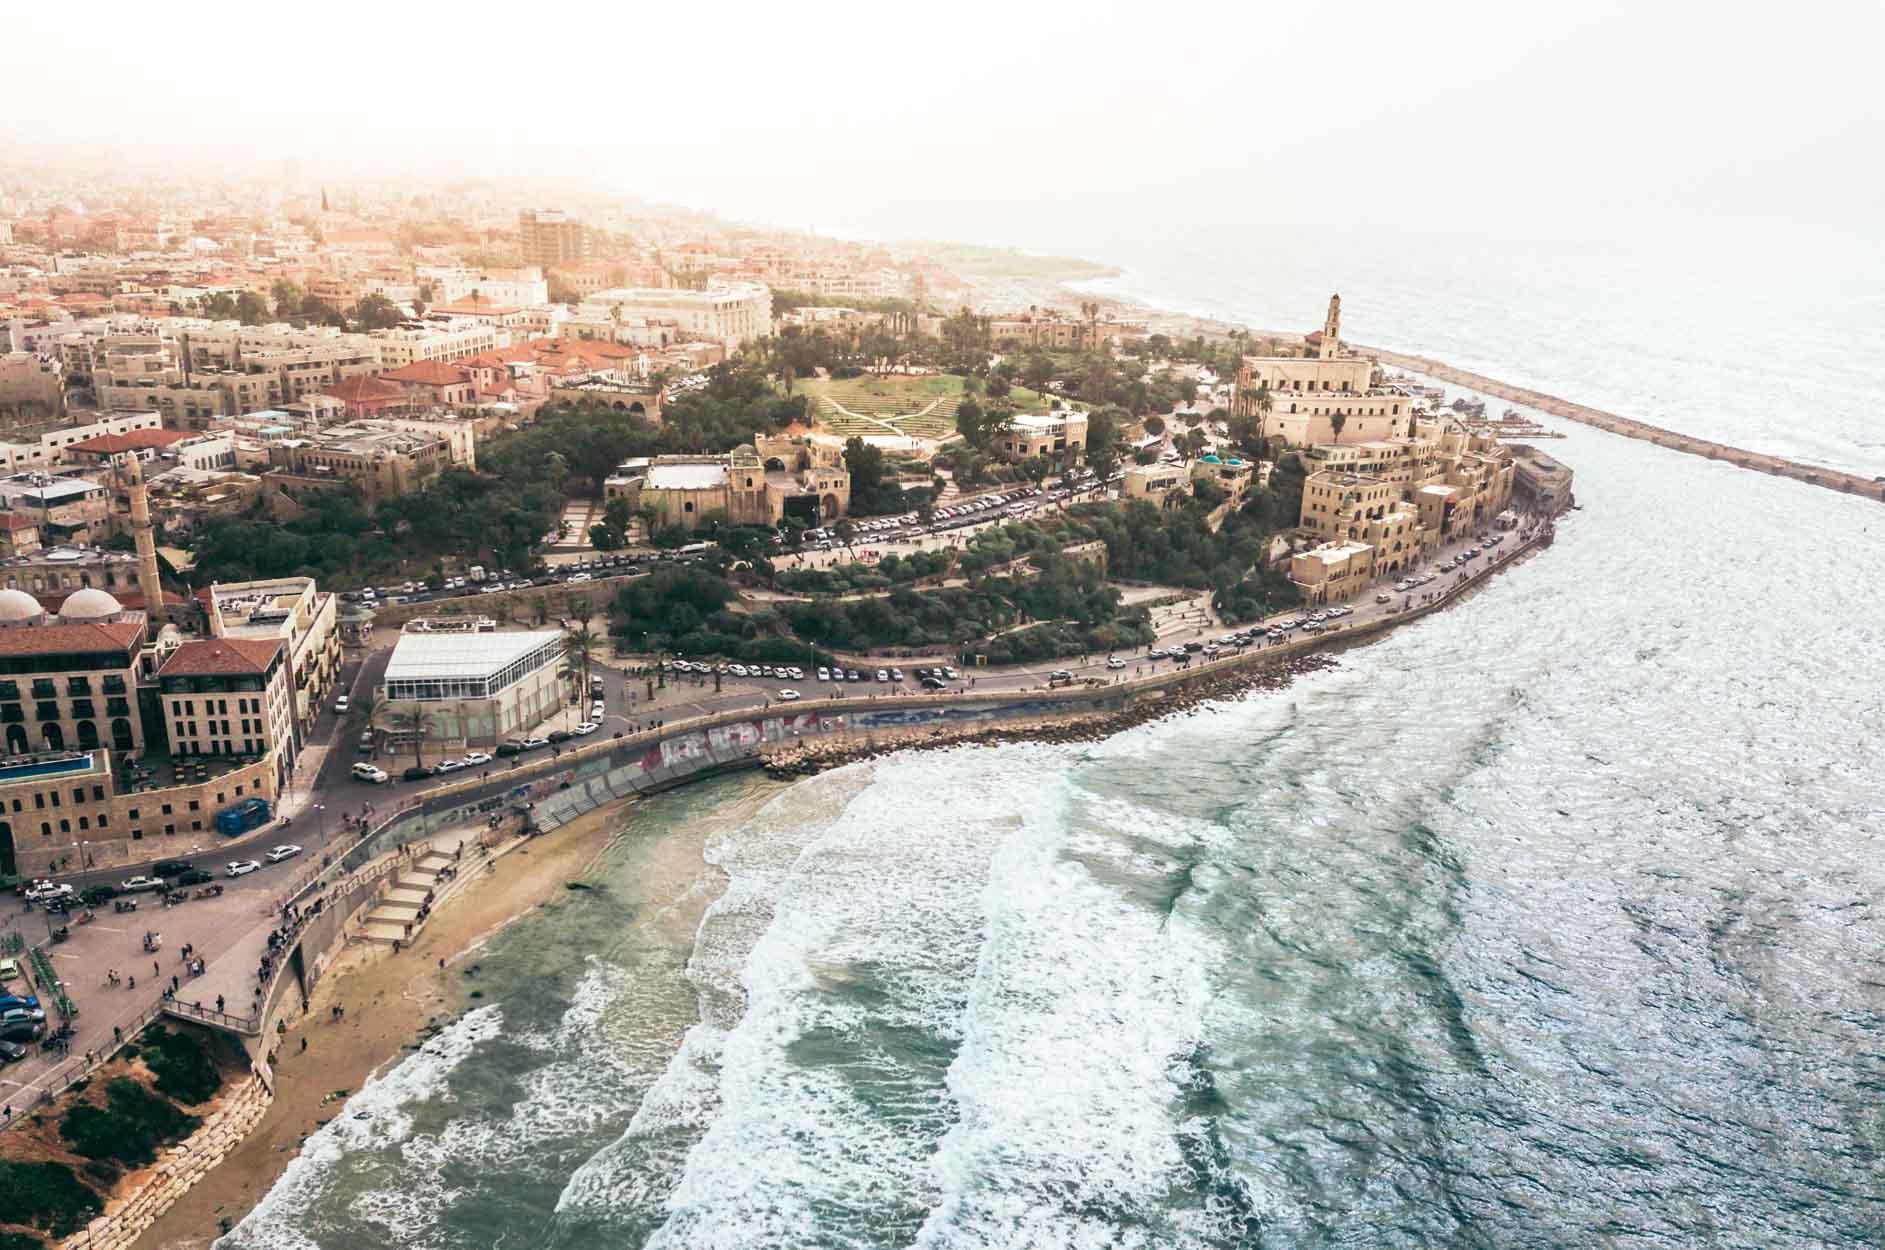 Eine Stadt am Meer in Israel.